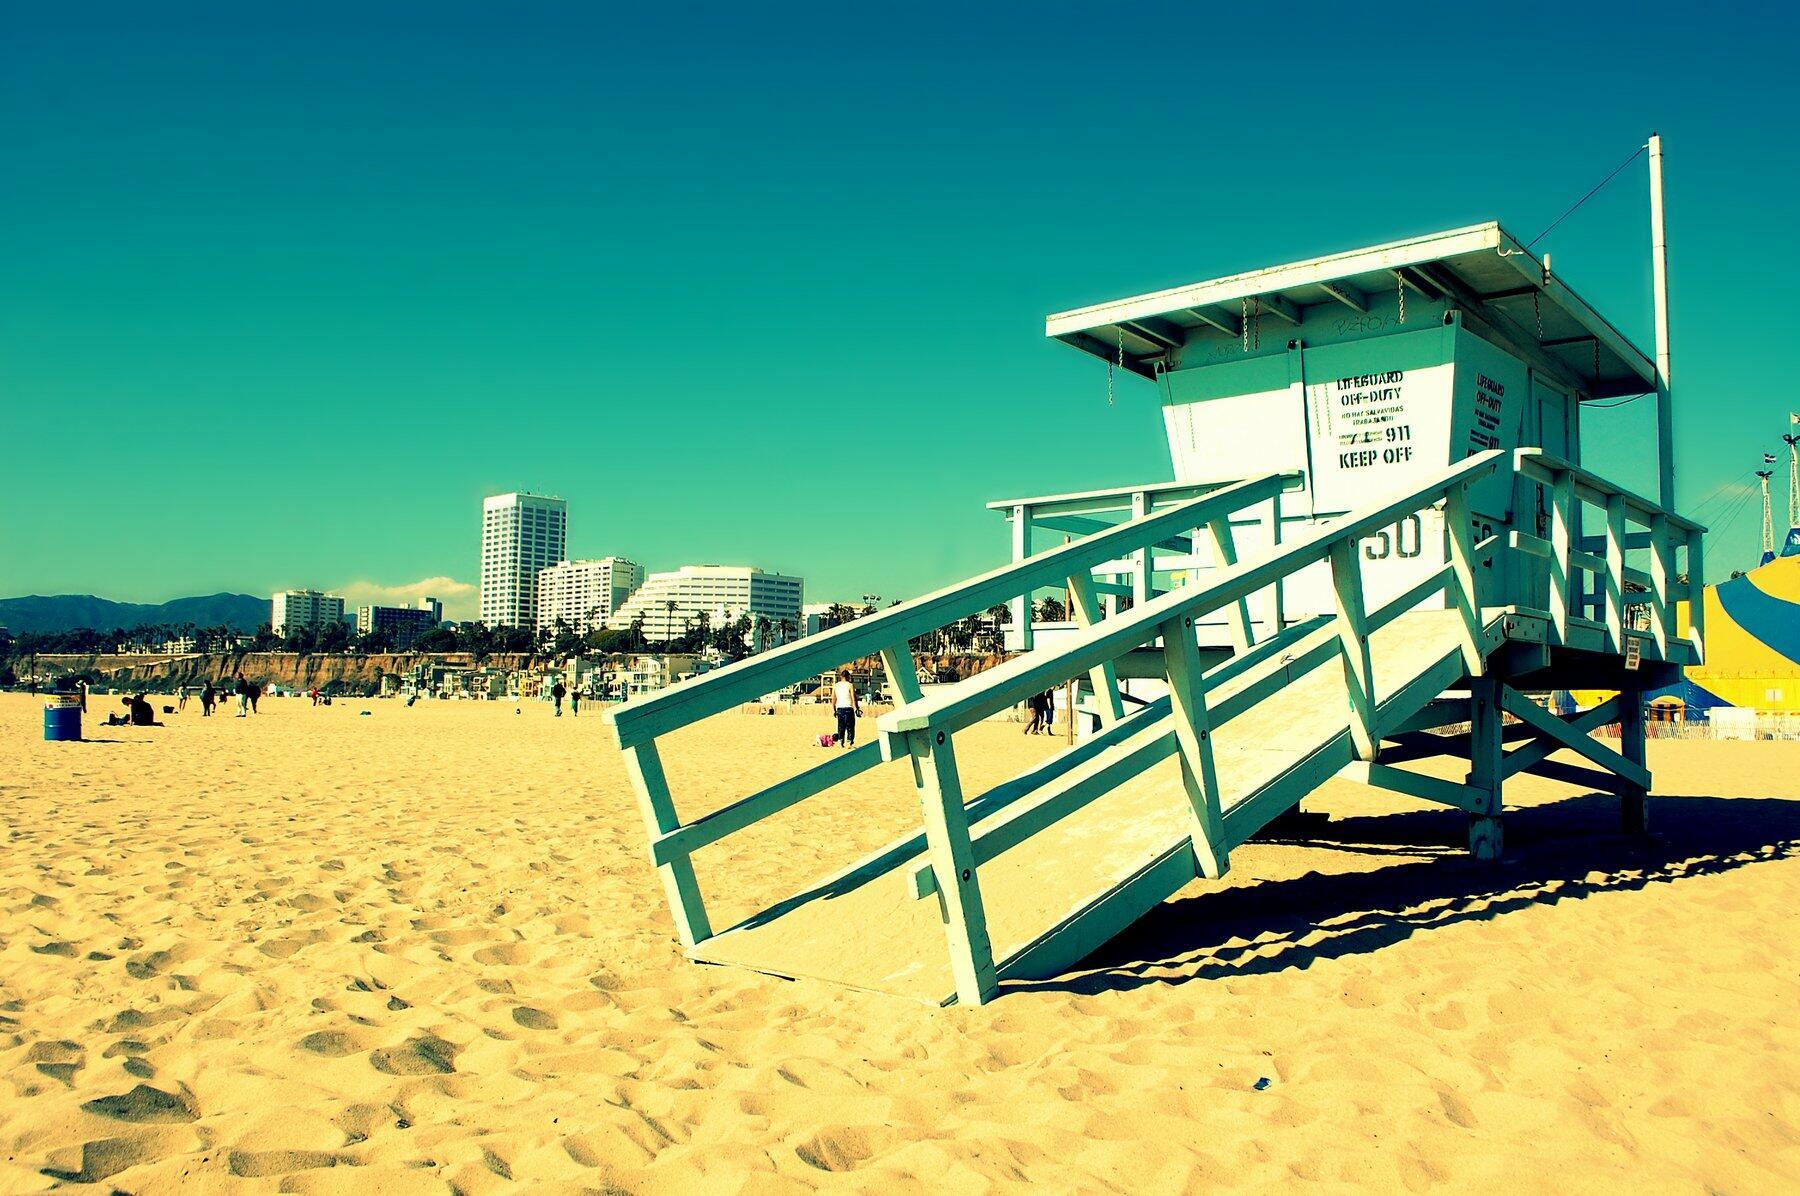 Lifeguard shack on a beach